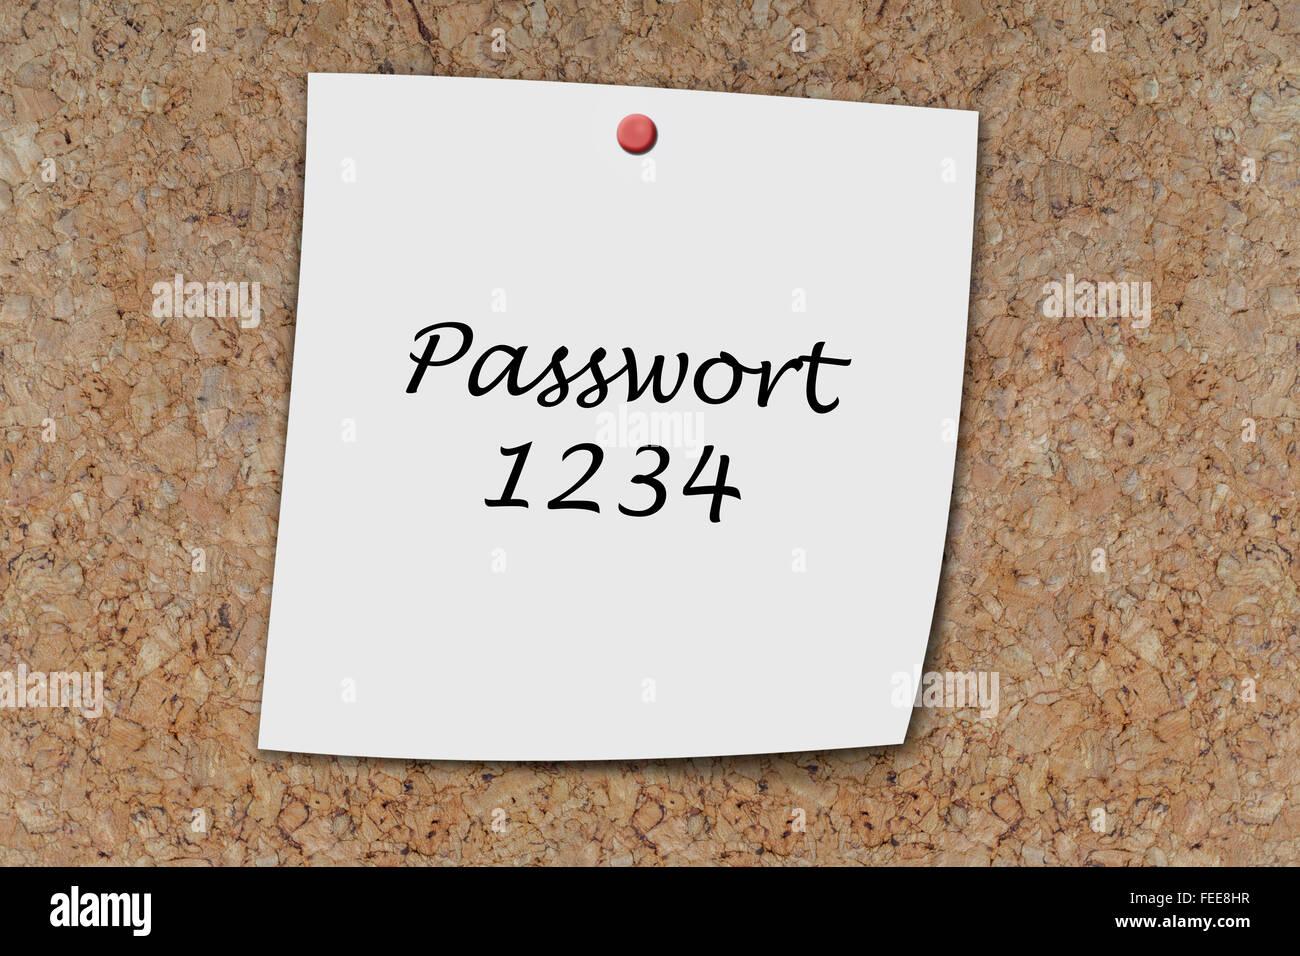 Passwort 1234 (German Password) written on a memo pinned on a cork board - Stock Image